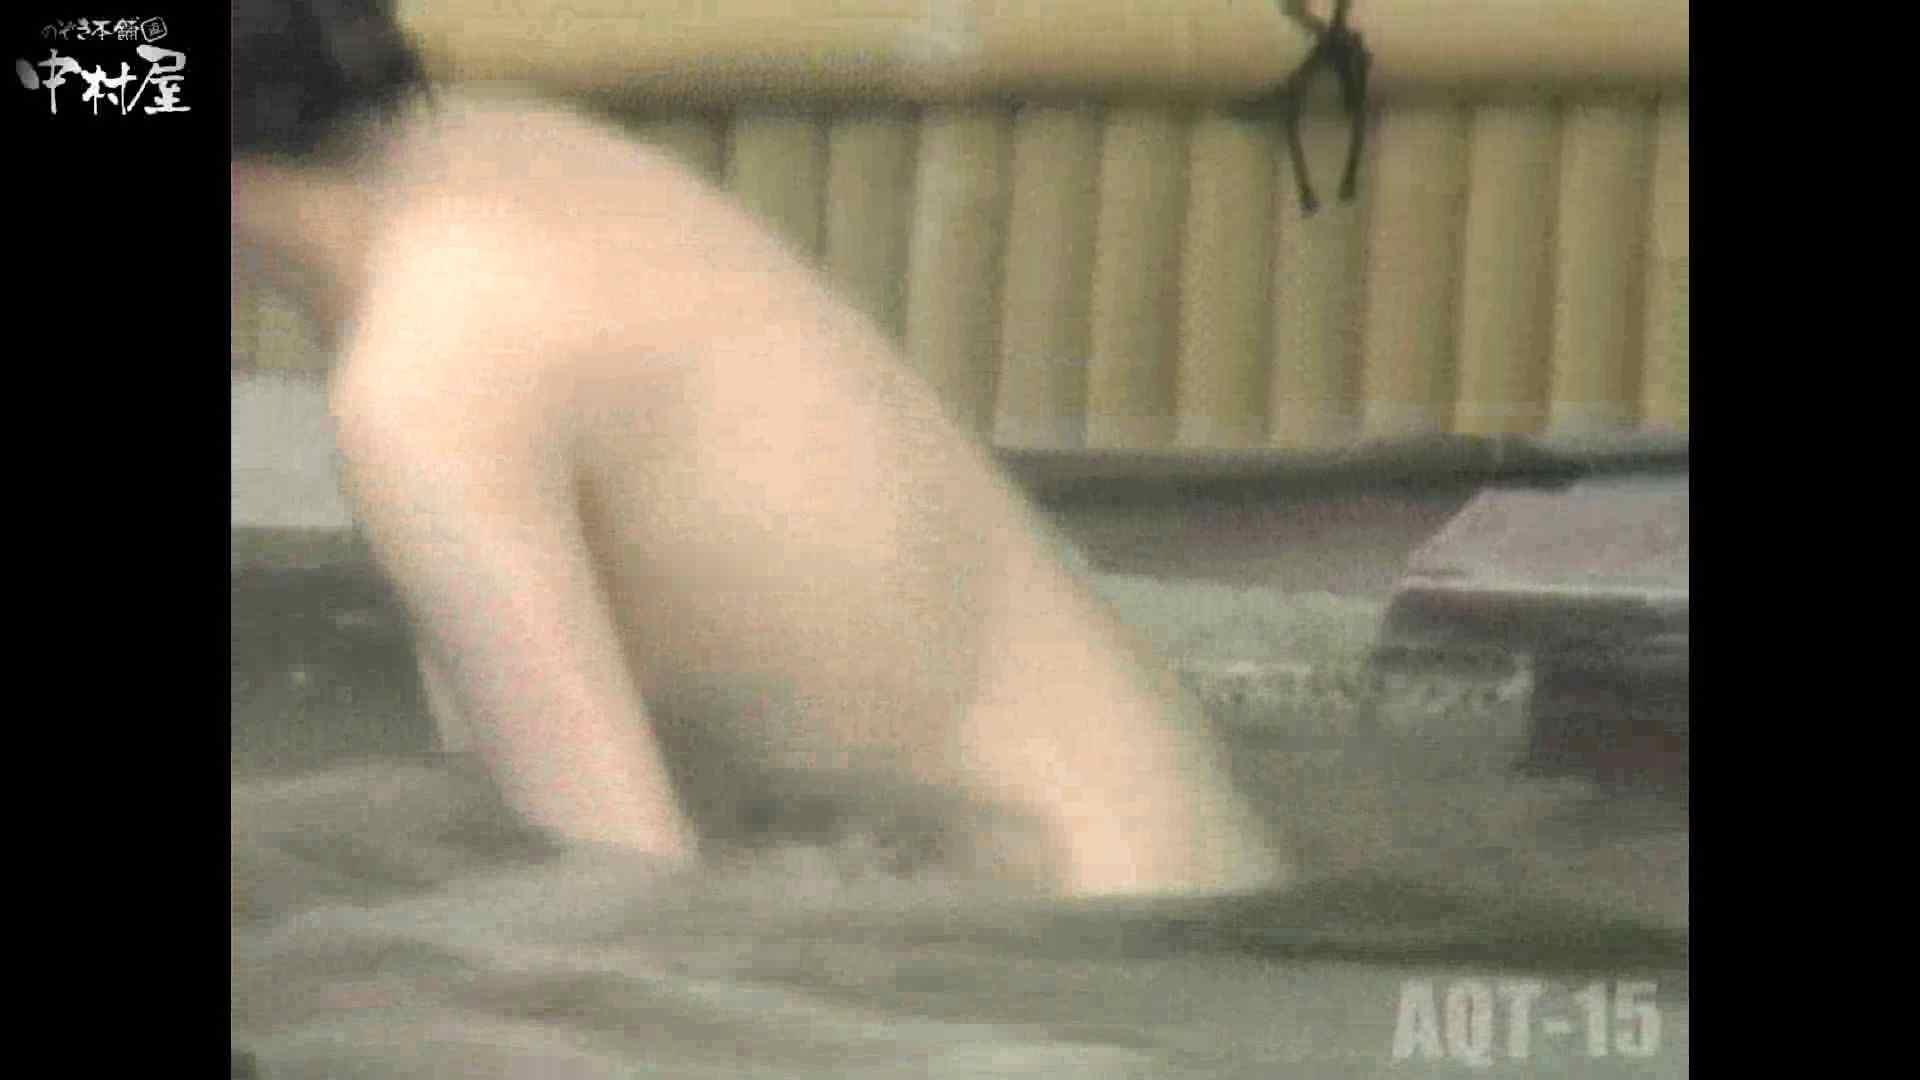 Aquaな露天風呂Vol.878潜入盗撮露天風呂十五判湯 其の三 潜入 | 盗撮  87画像 69